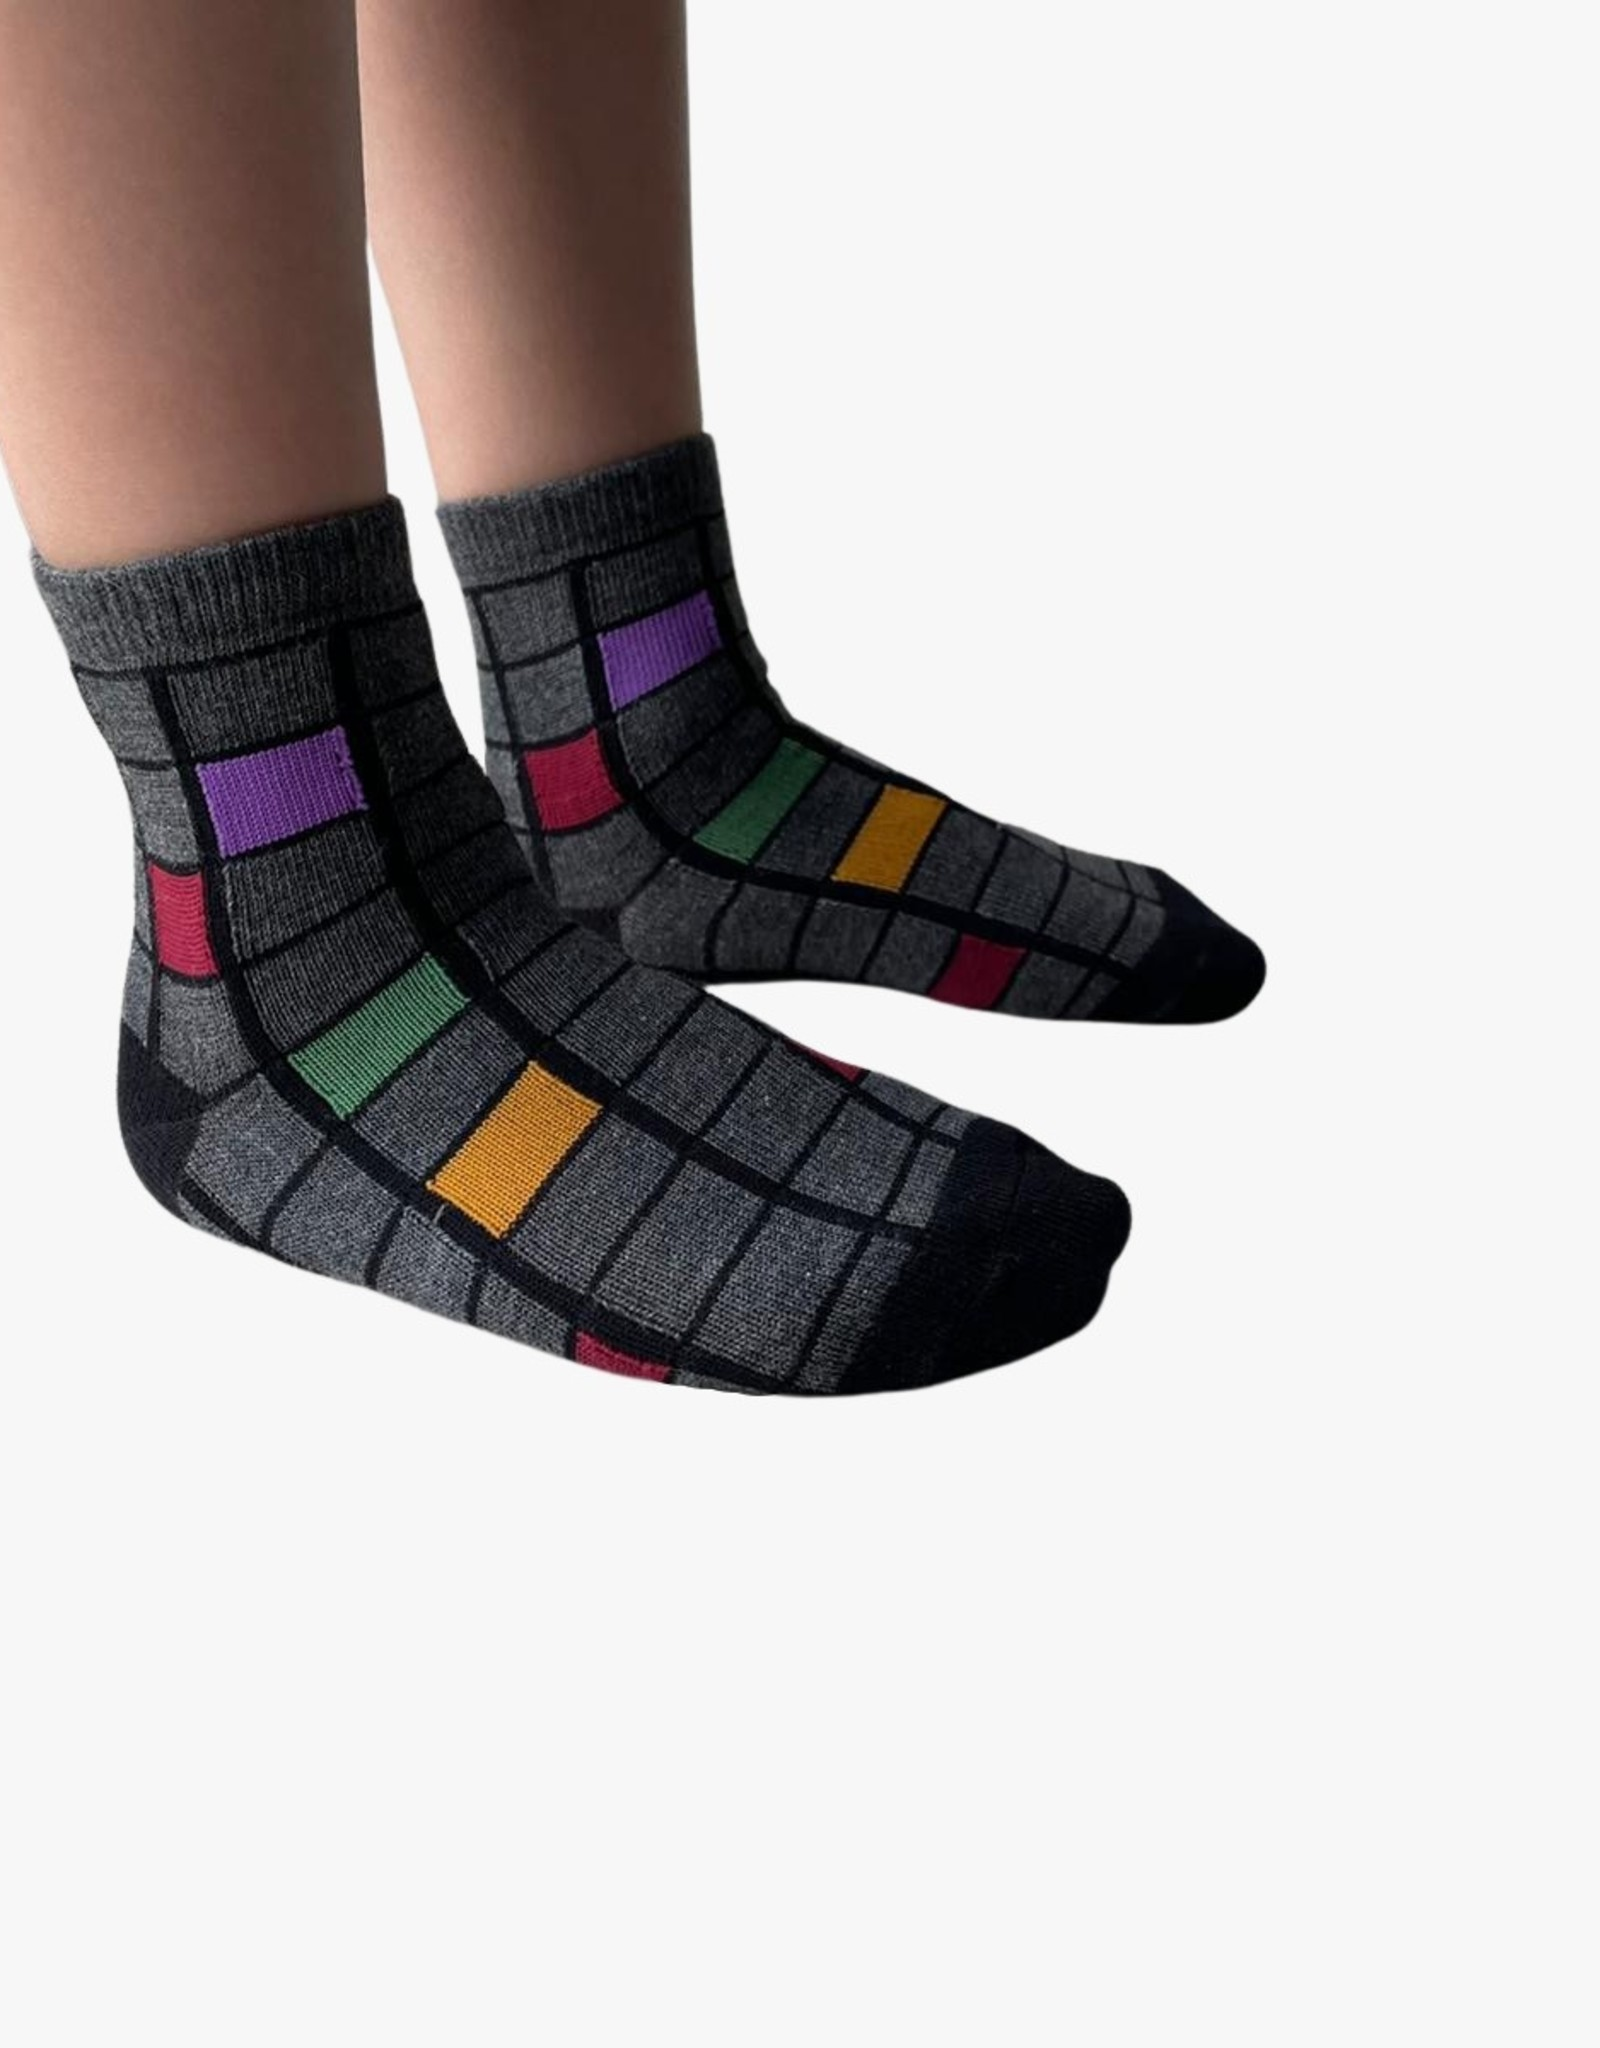 Blinq Blinq Colored Cube Socks